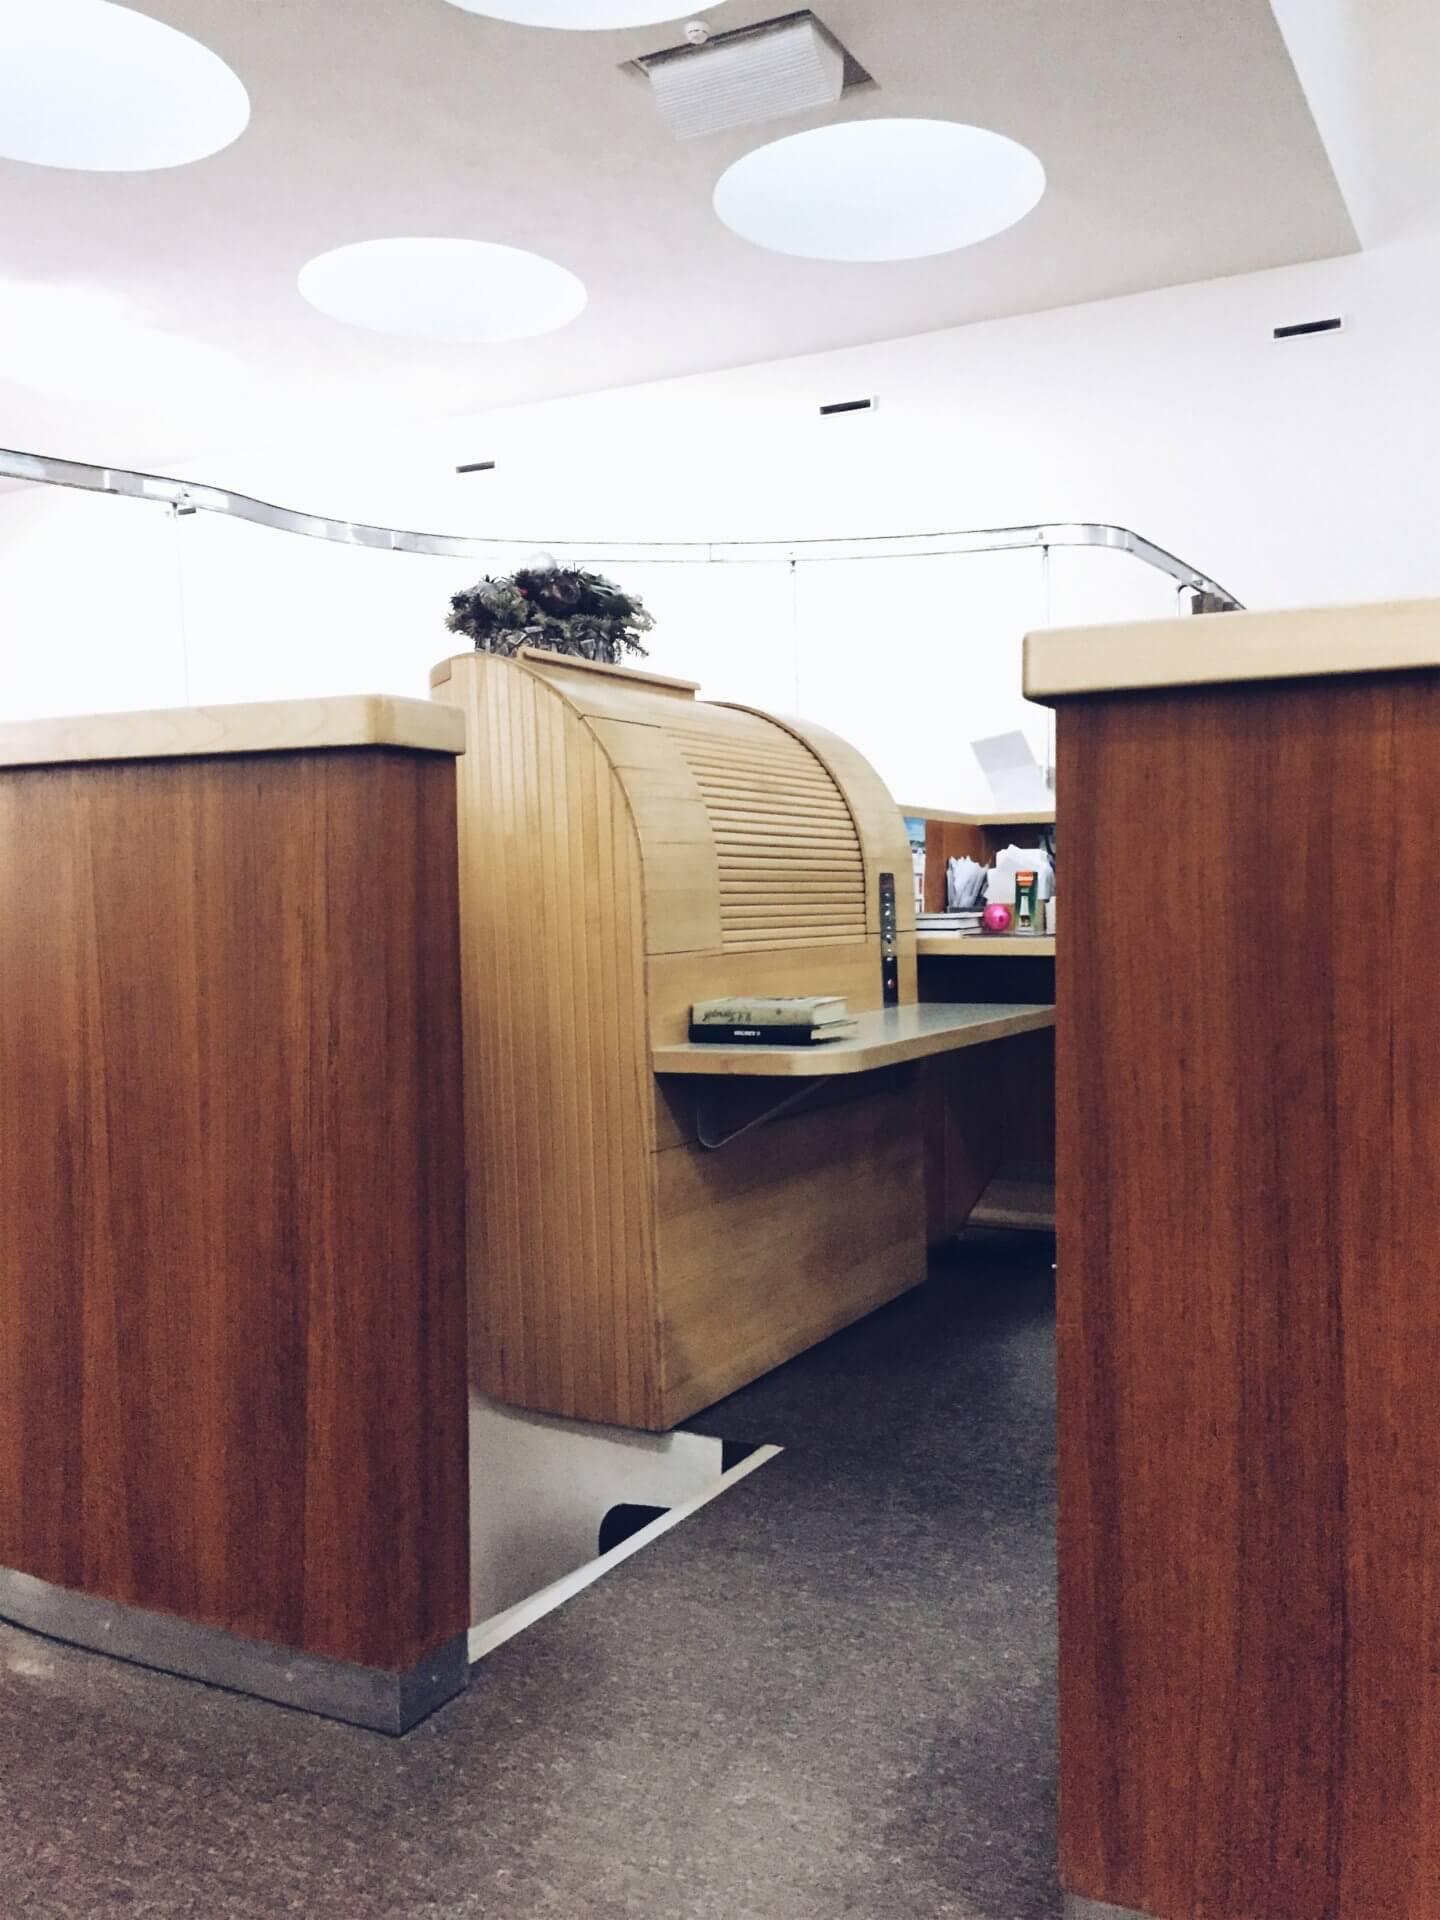 Alvar-Aalto-Library-Viborg-book-lift